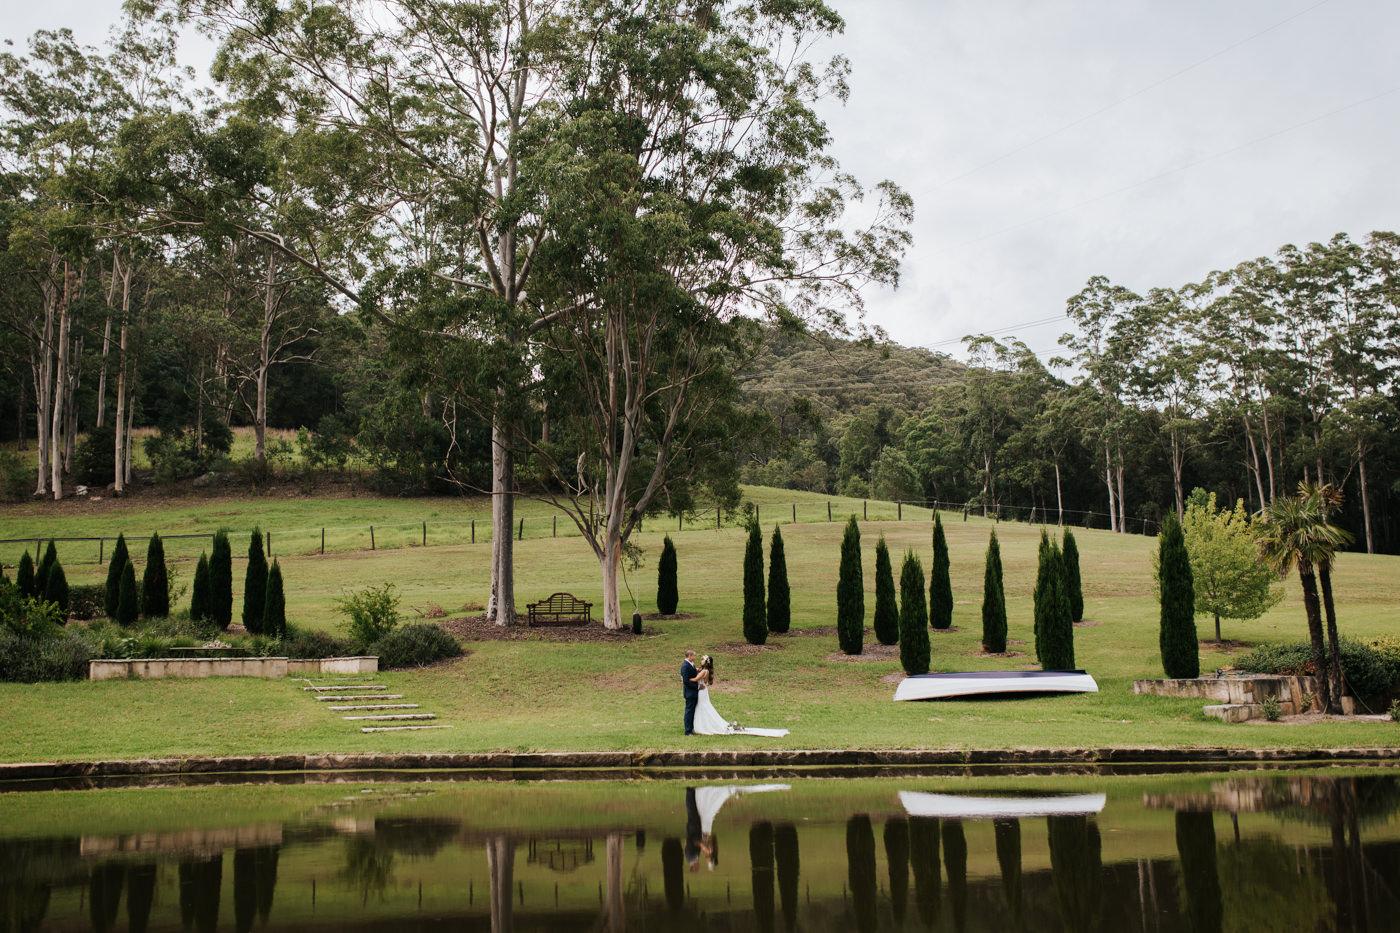 Nick & Vanezza - Fernbank Farm Wedding - Samantha Heather Photography-117.jpg